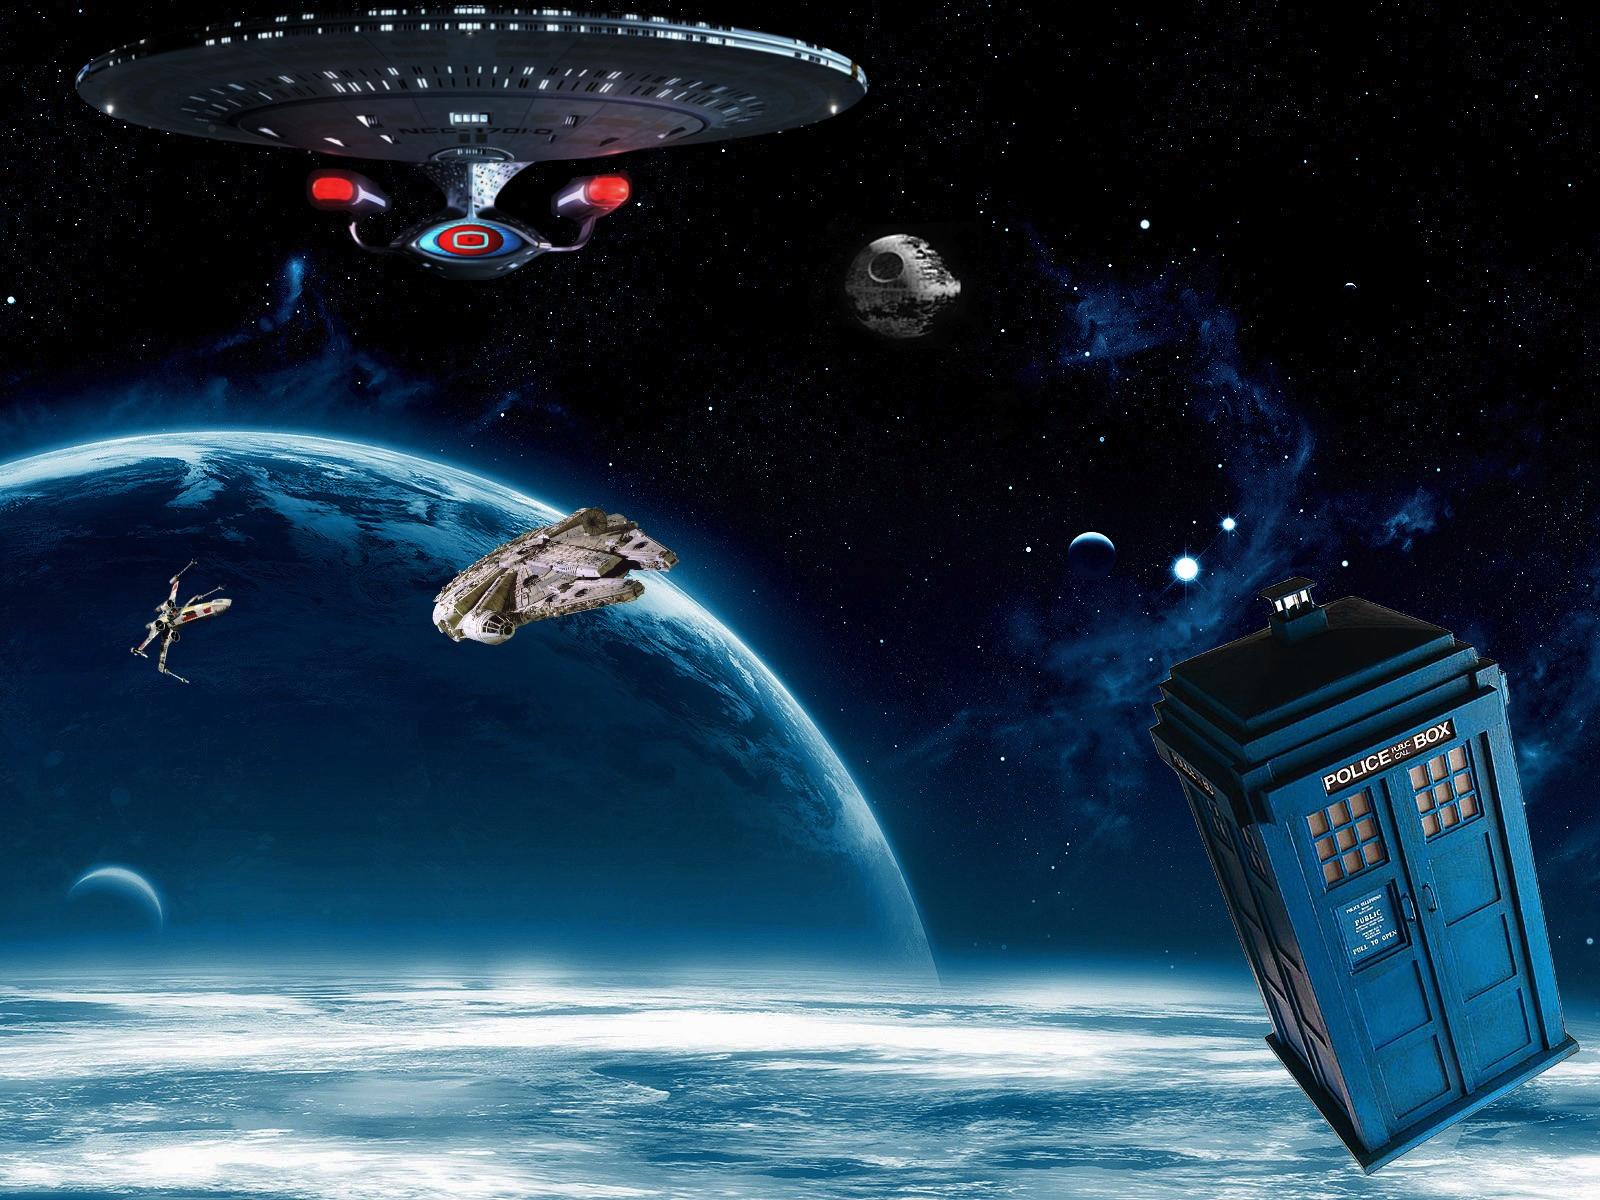 Star Wars Star Trek Uss Enterprise Doctor Who Crossovers Nc 1701 D 1600x1200 Wallpaper Uss Enterprise Star Trek Star Wars Star Pictures